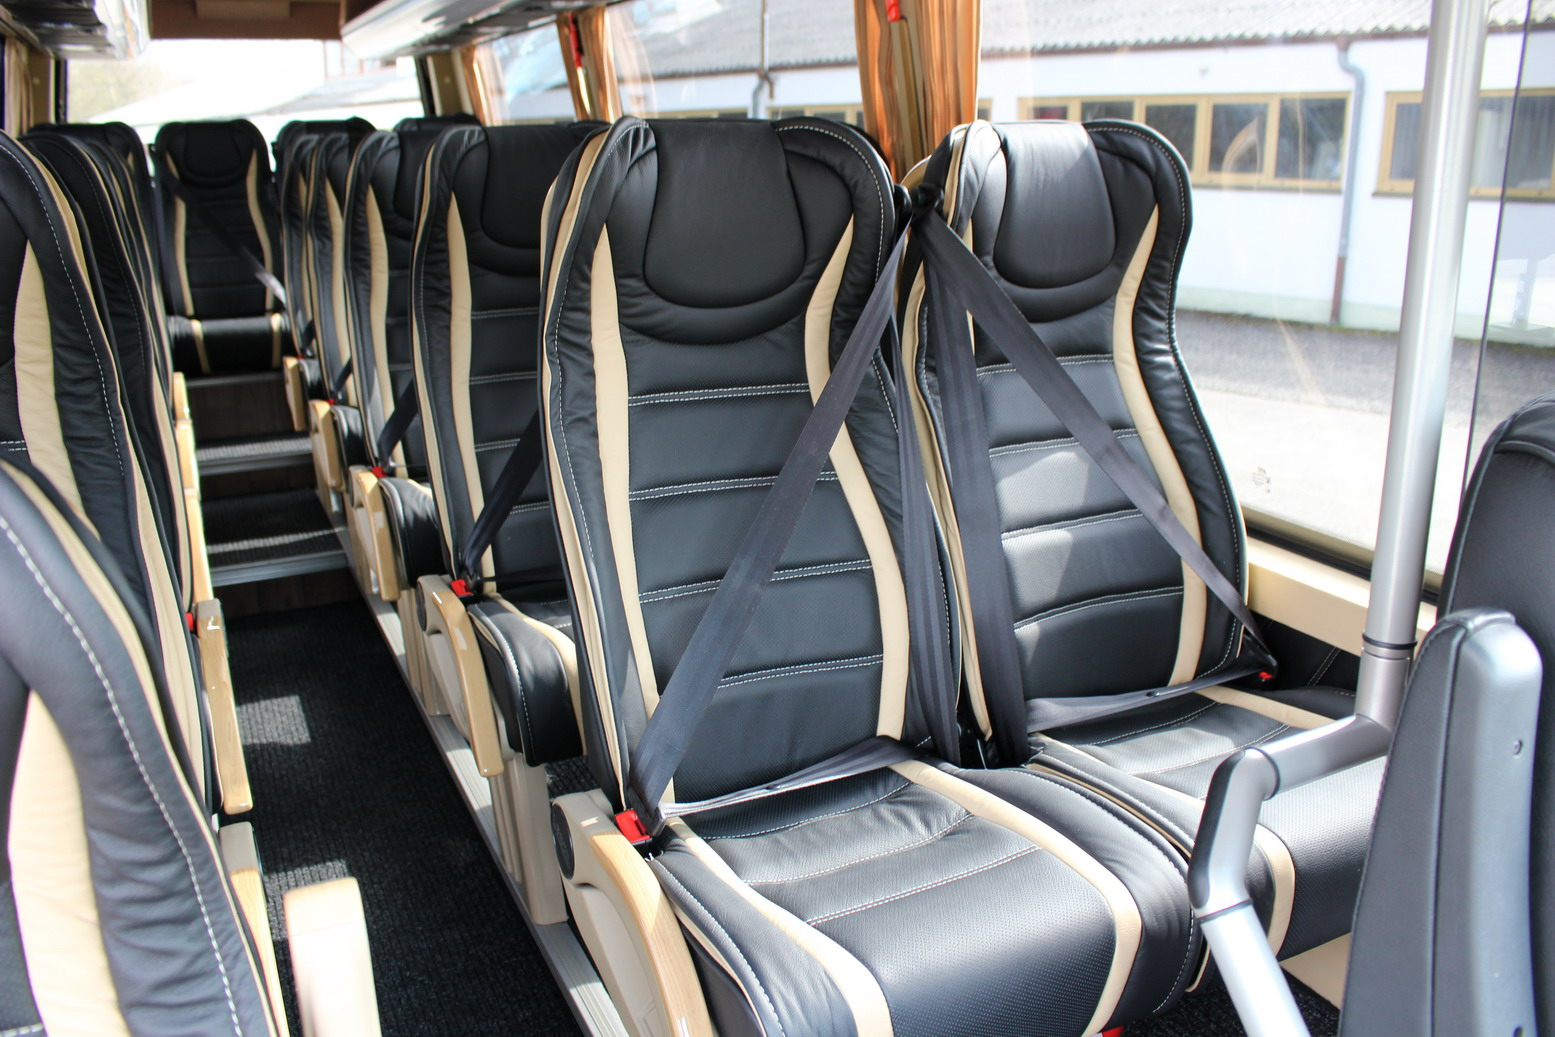 Mercedes Sprinter 519 Cdi 19 1 1 Or 16 1 1 Seats Vip